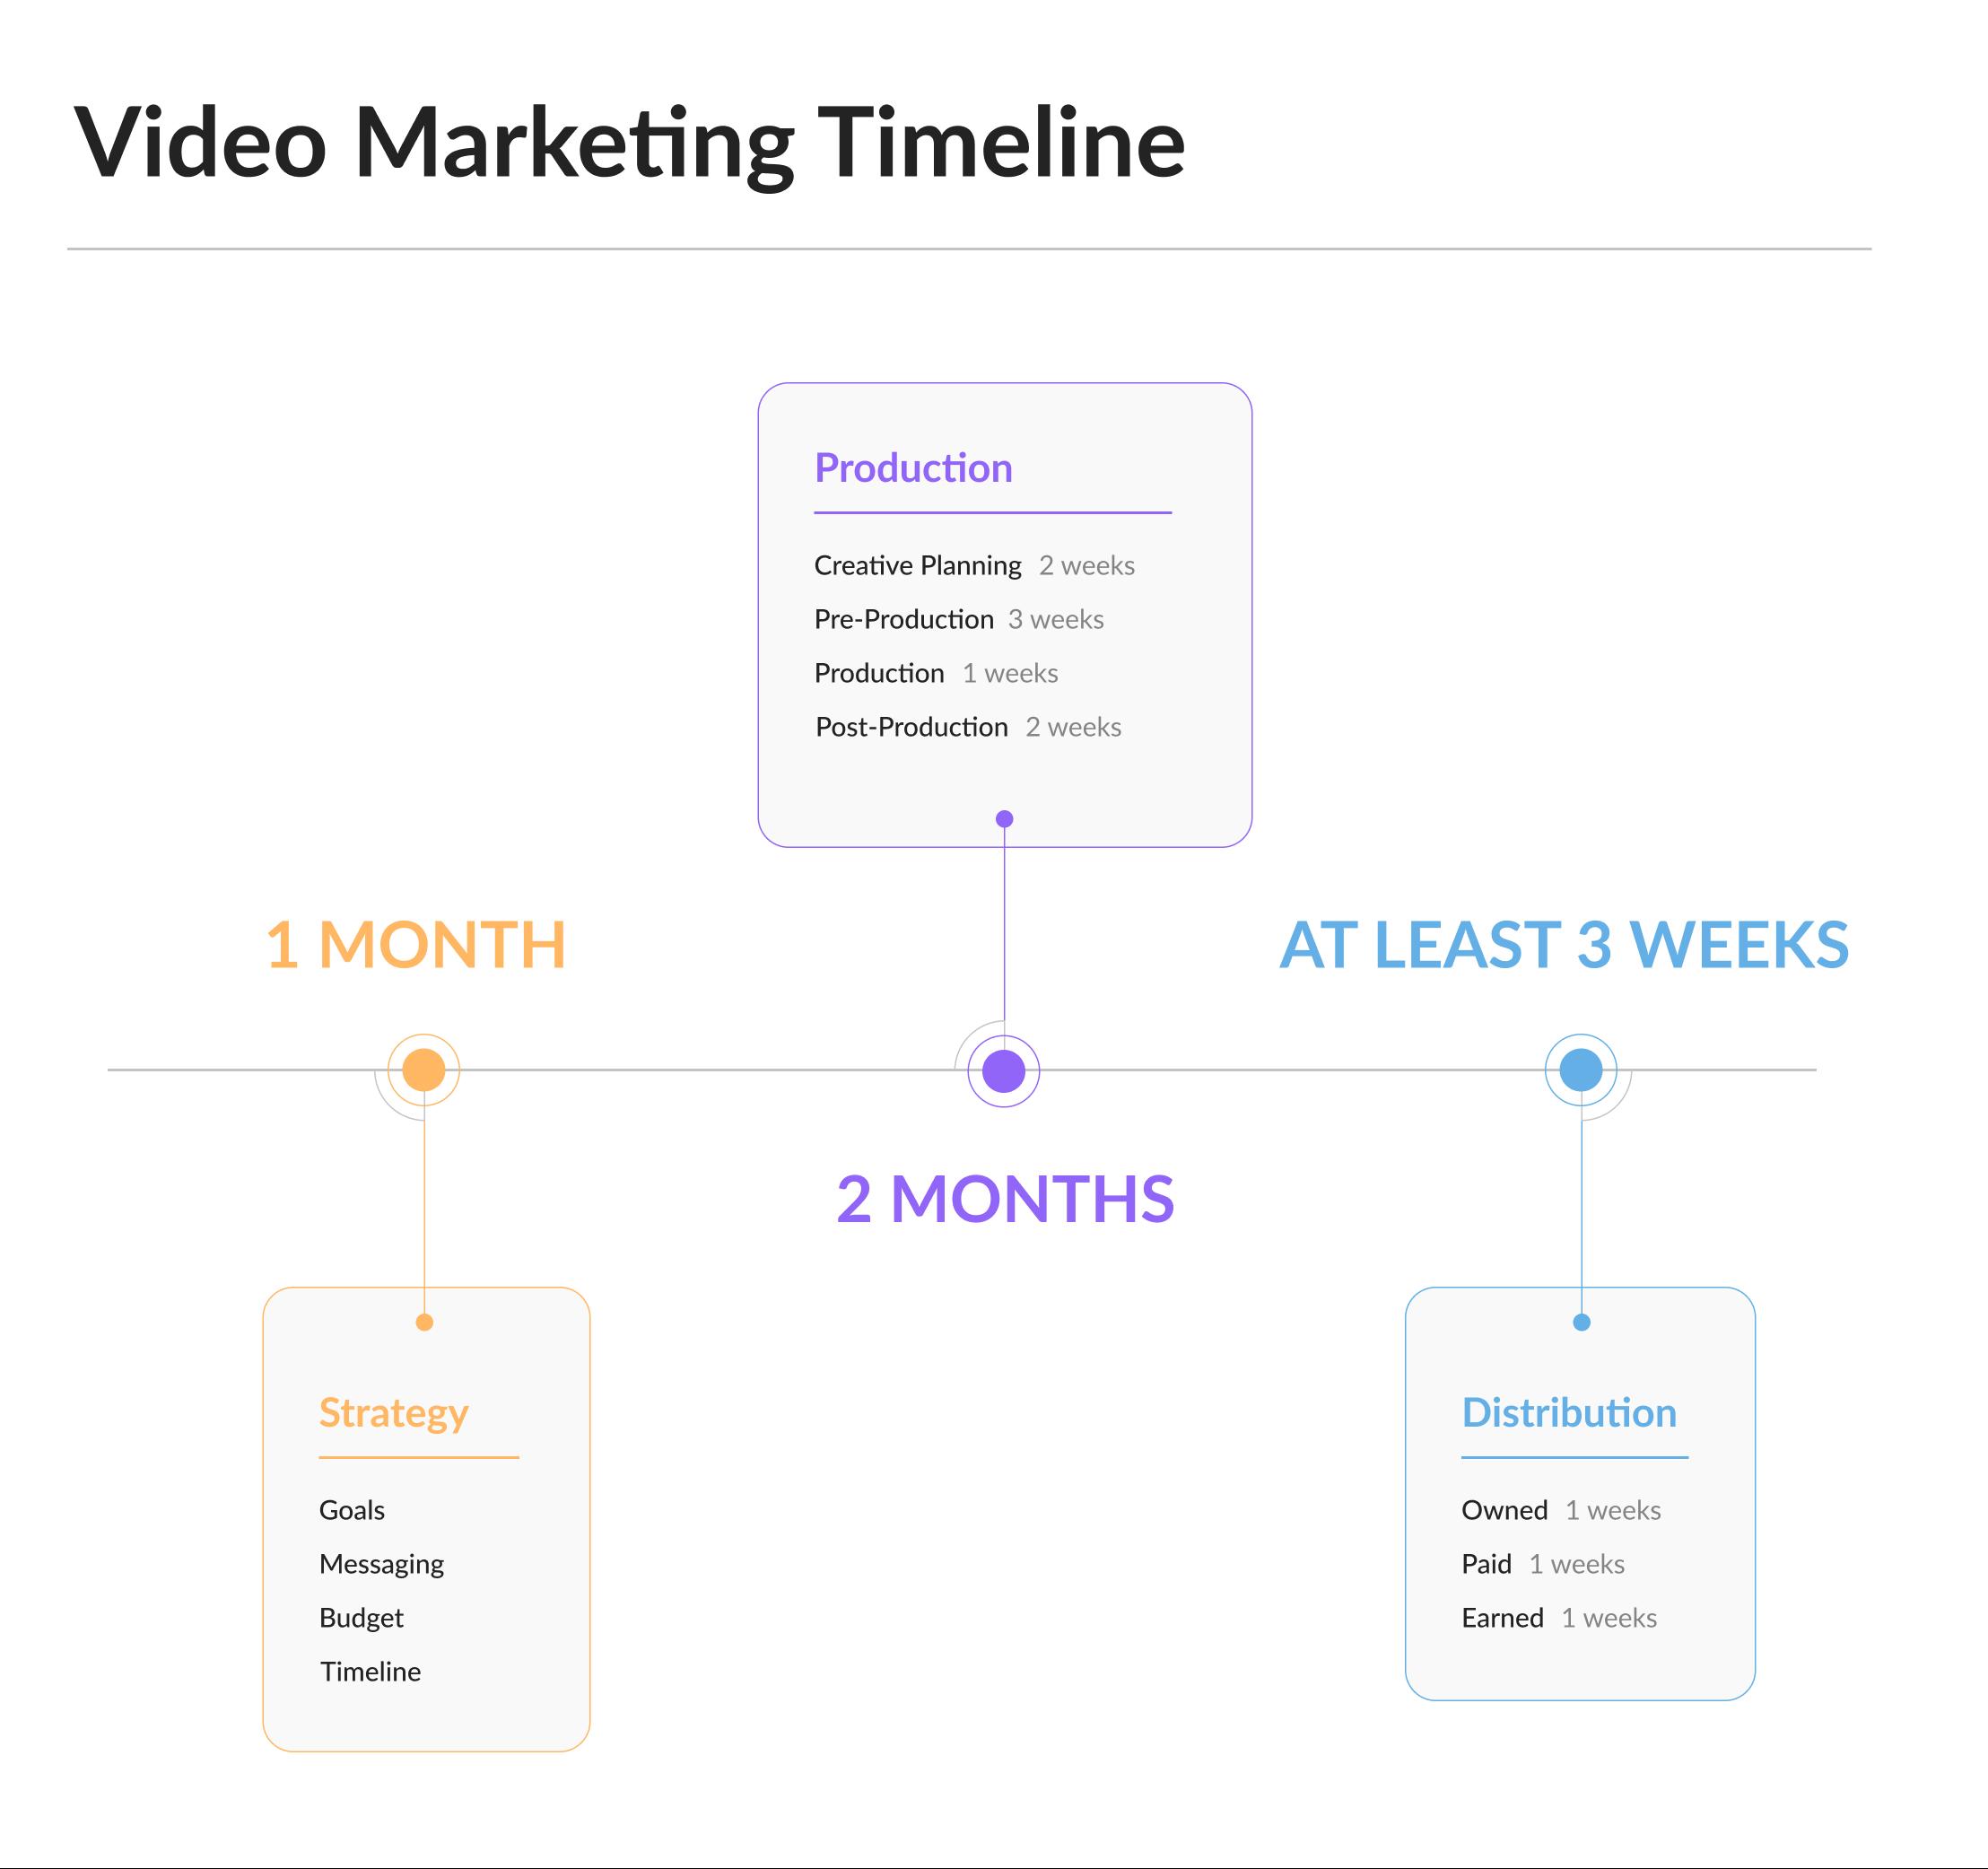 Video Marketing Timeline: Strategy Development, Production, Distribution